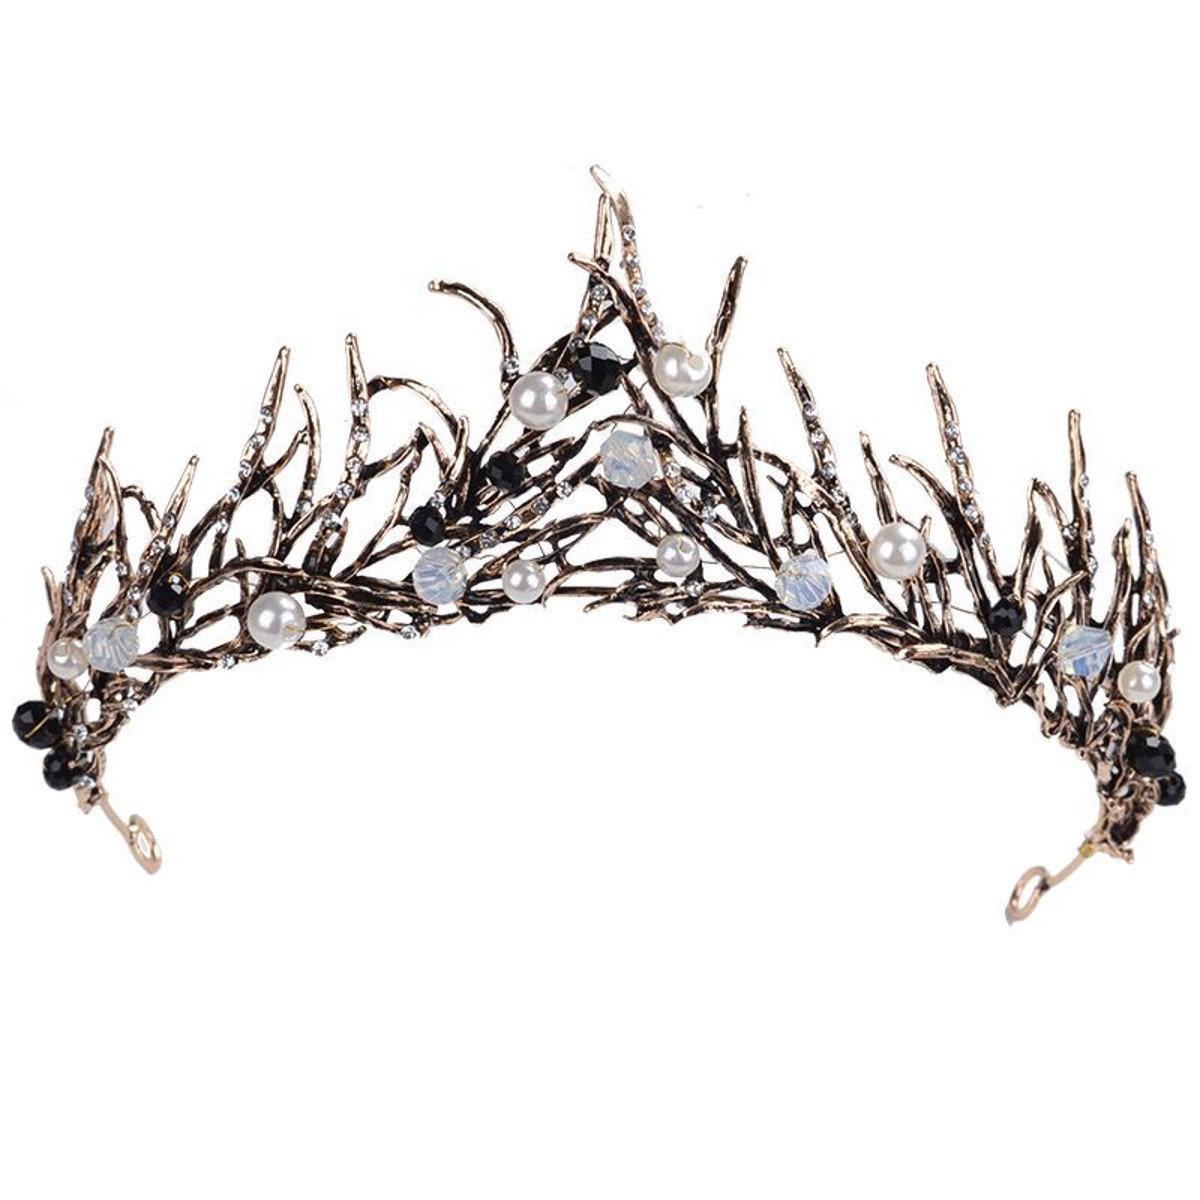 Vintage Wedding Hairband Baroque Antique Tiara Black White Crystal Pearl Beads Pageant Crown